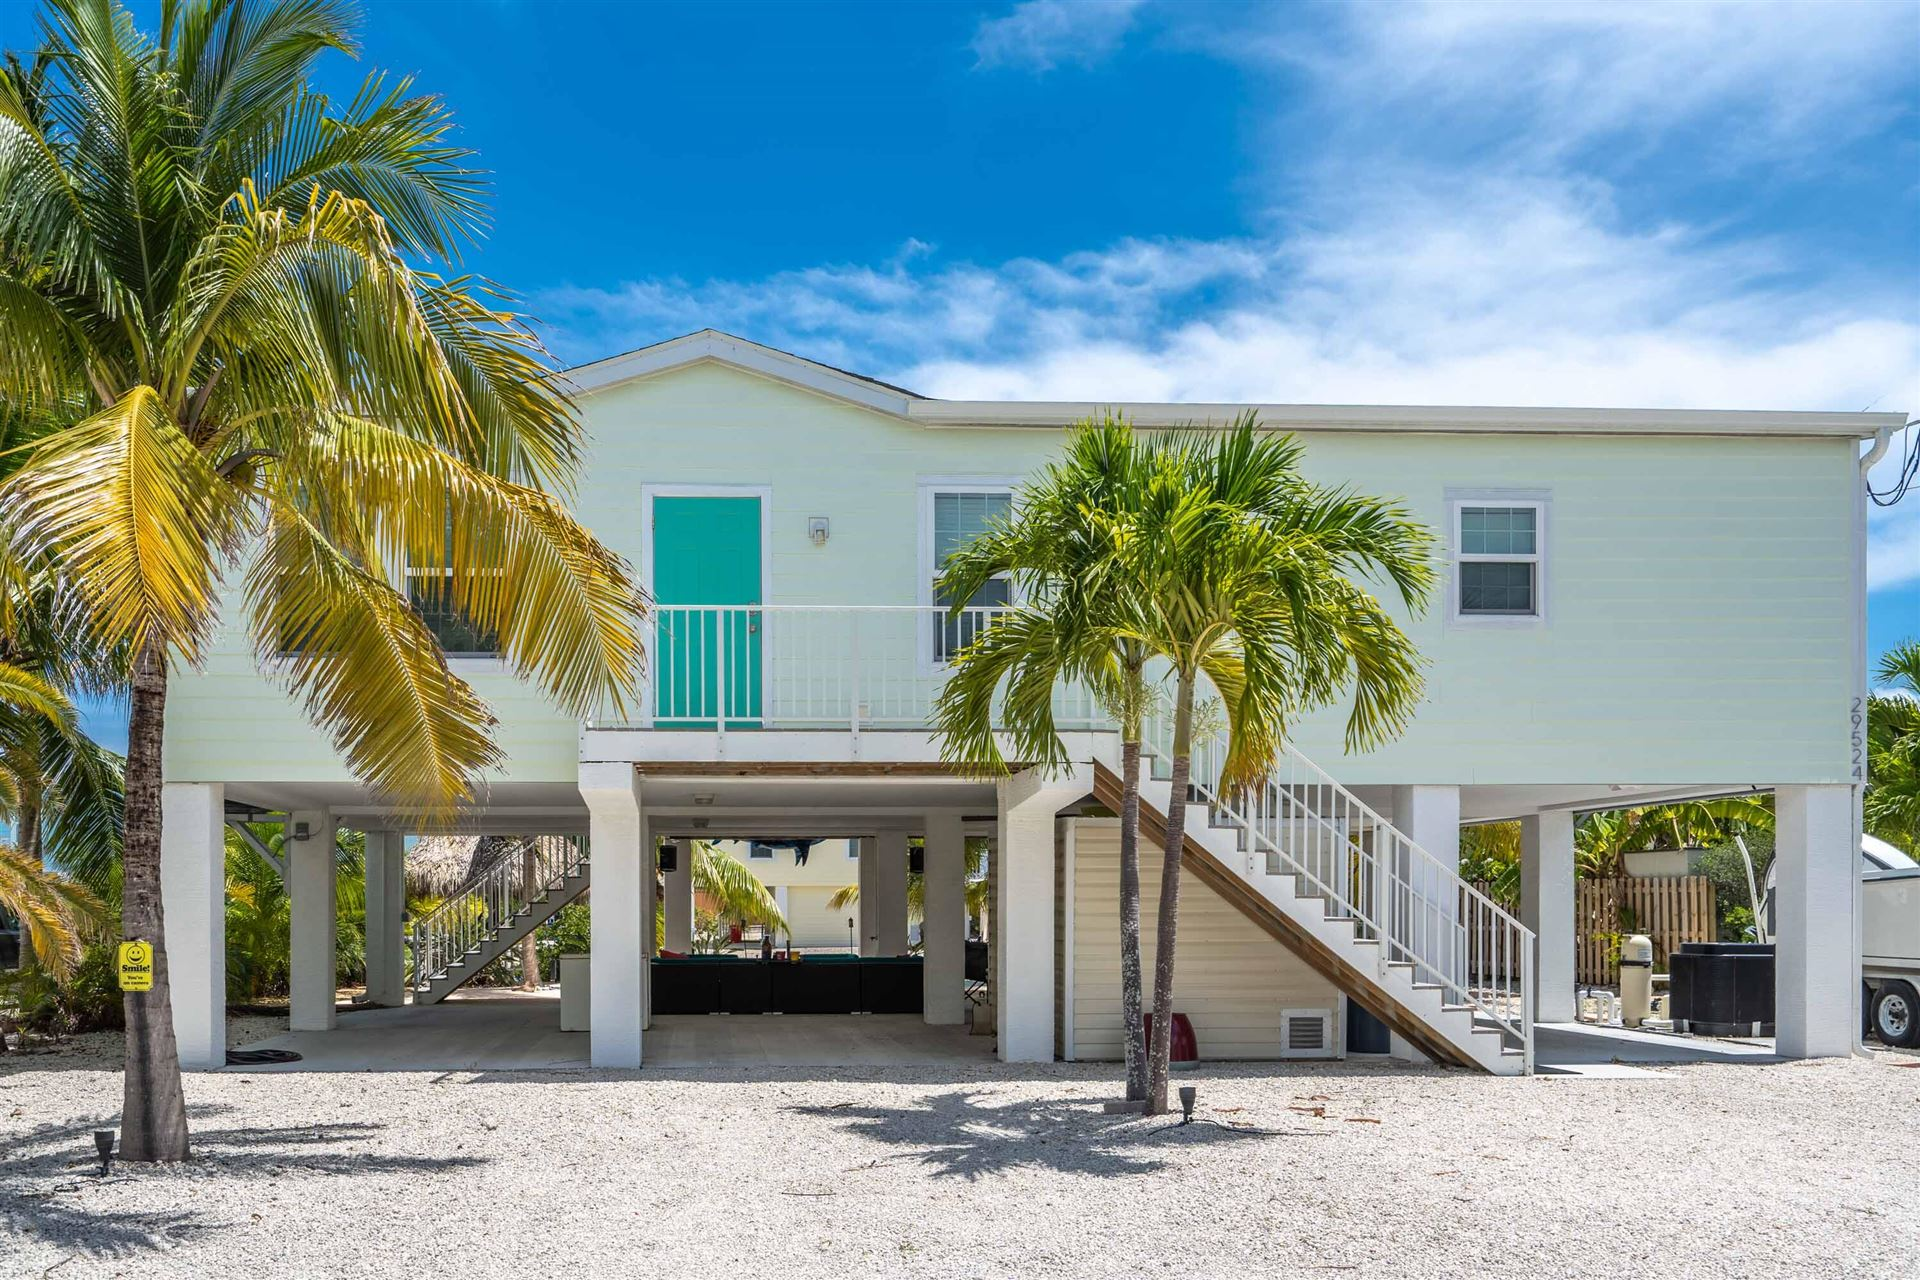 29524 Flying Cloud Avenue, Big Pine, FL 33043 - #: 596567